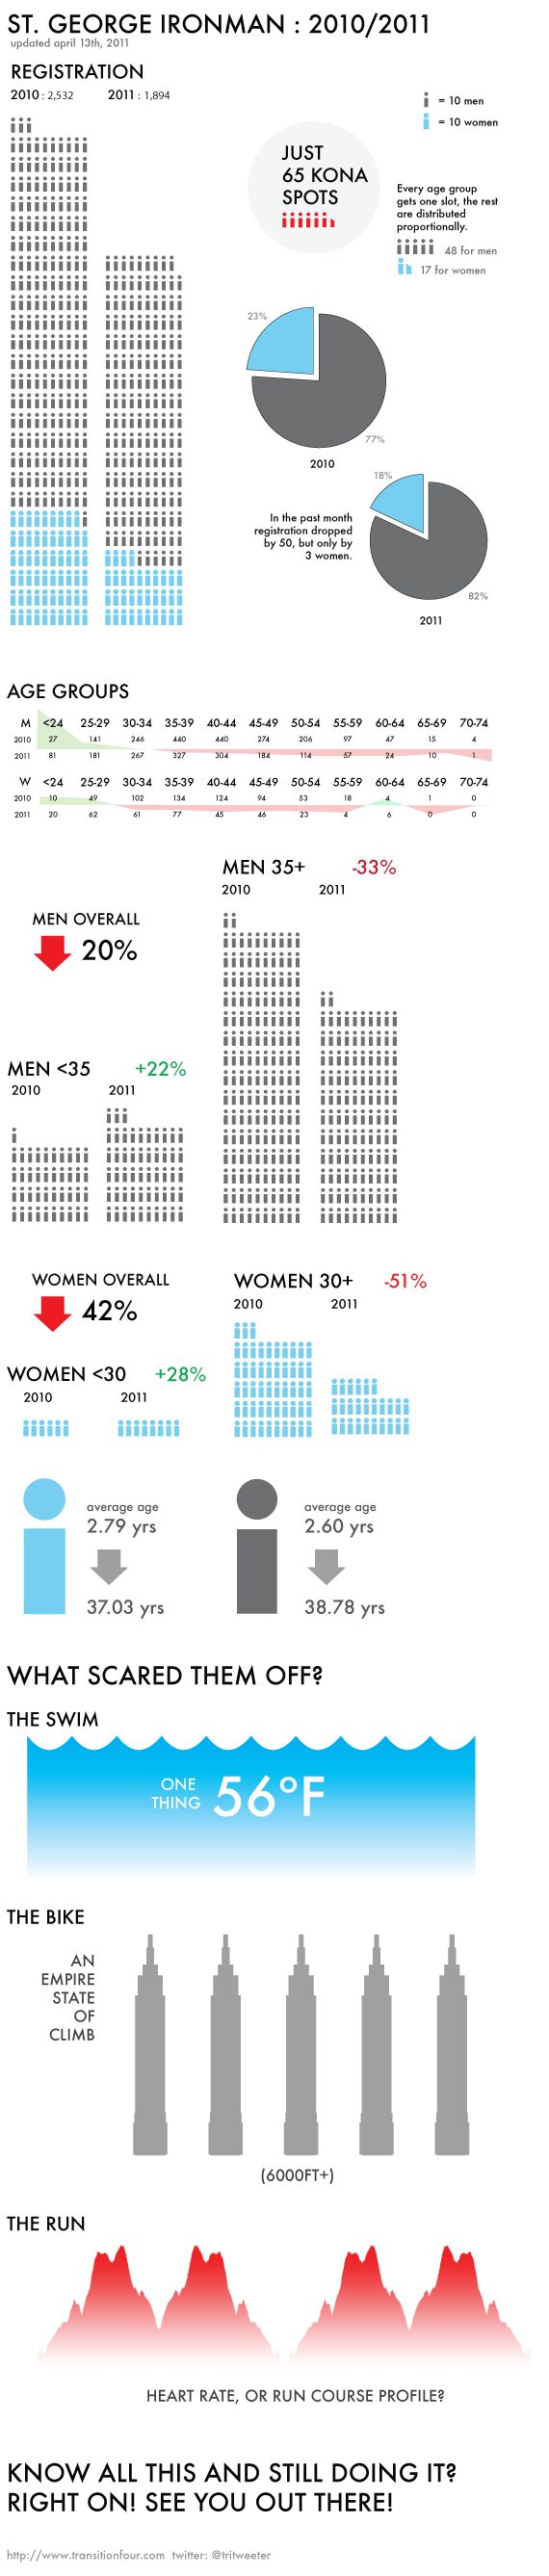 ironman st. george infographic